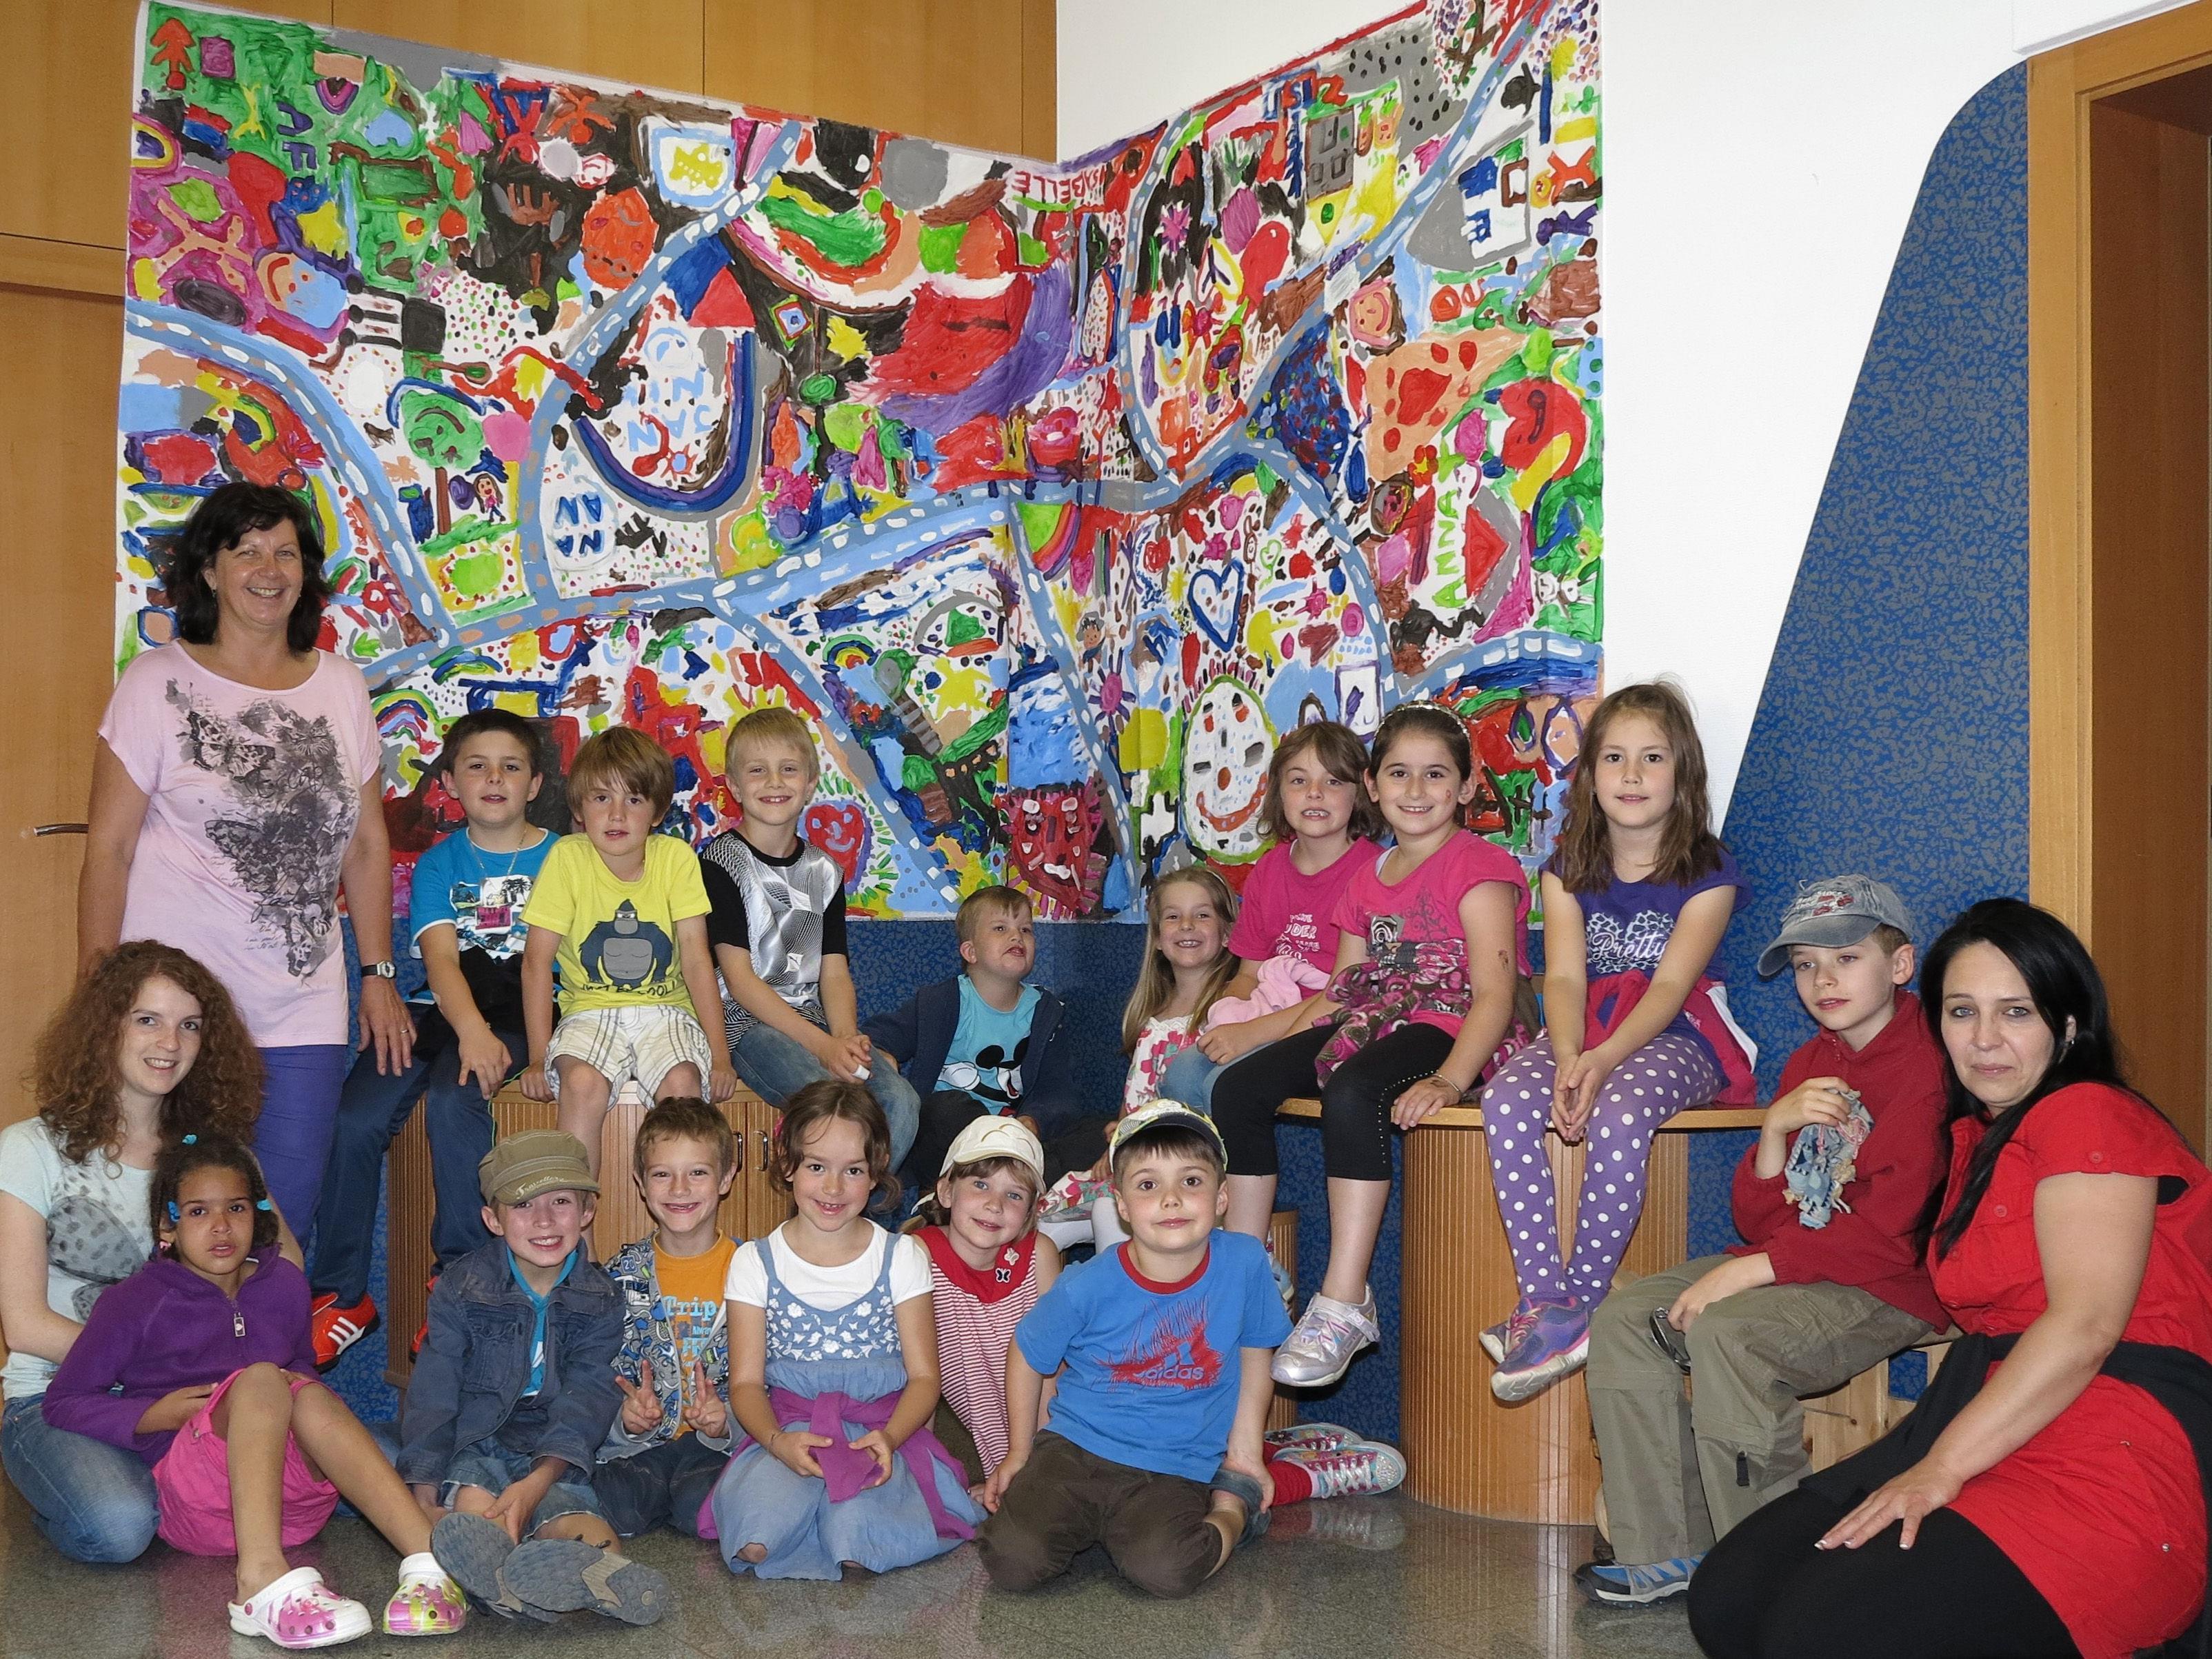 Nofler Volksschüler zeigen ihre Kunstwerke.